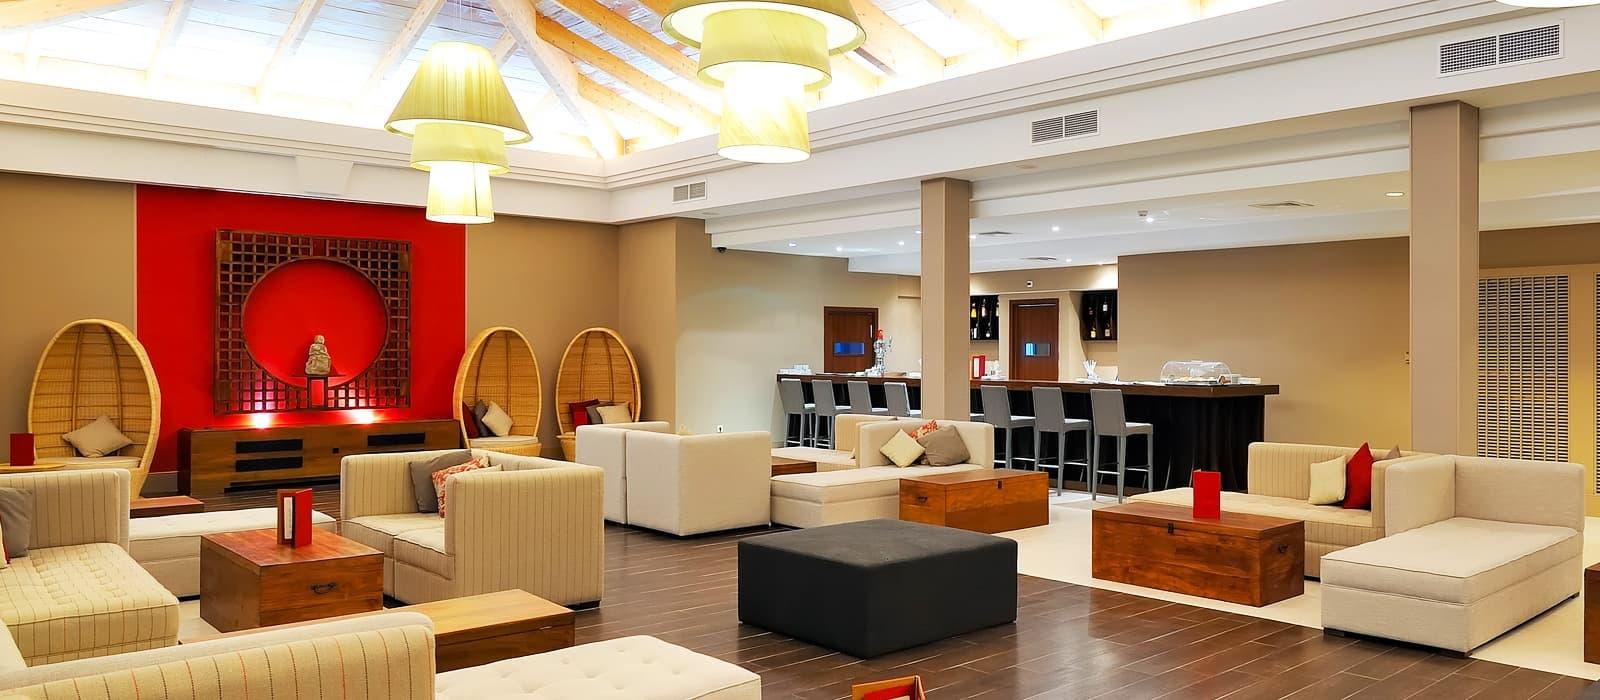 Hoteles Vincci. Hotel Vincci Costa Golf Cadice